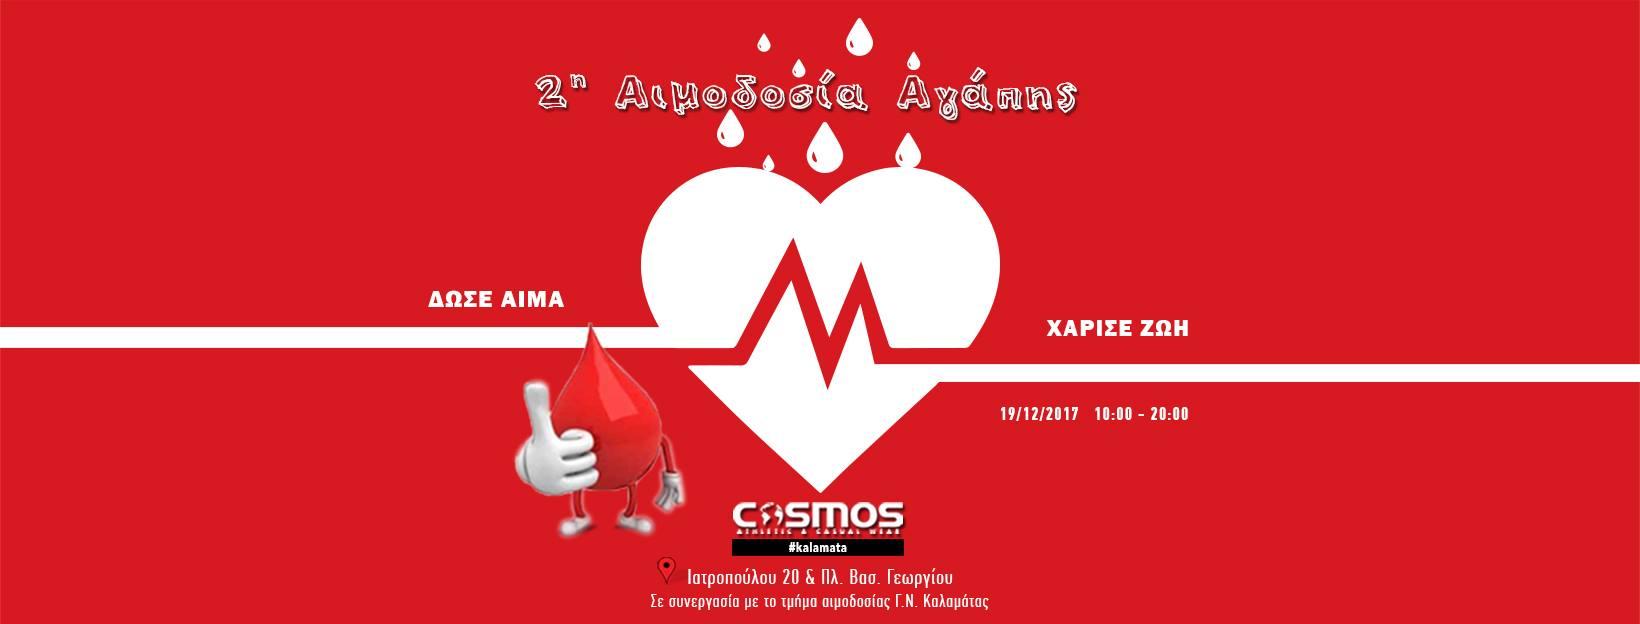 COSMOS Καλαμάτας: 2η εθελοντική αιμοδοσία την Τρίτη 19 Δεκεμβρίου